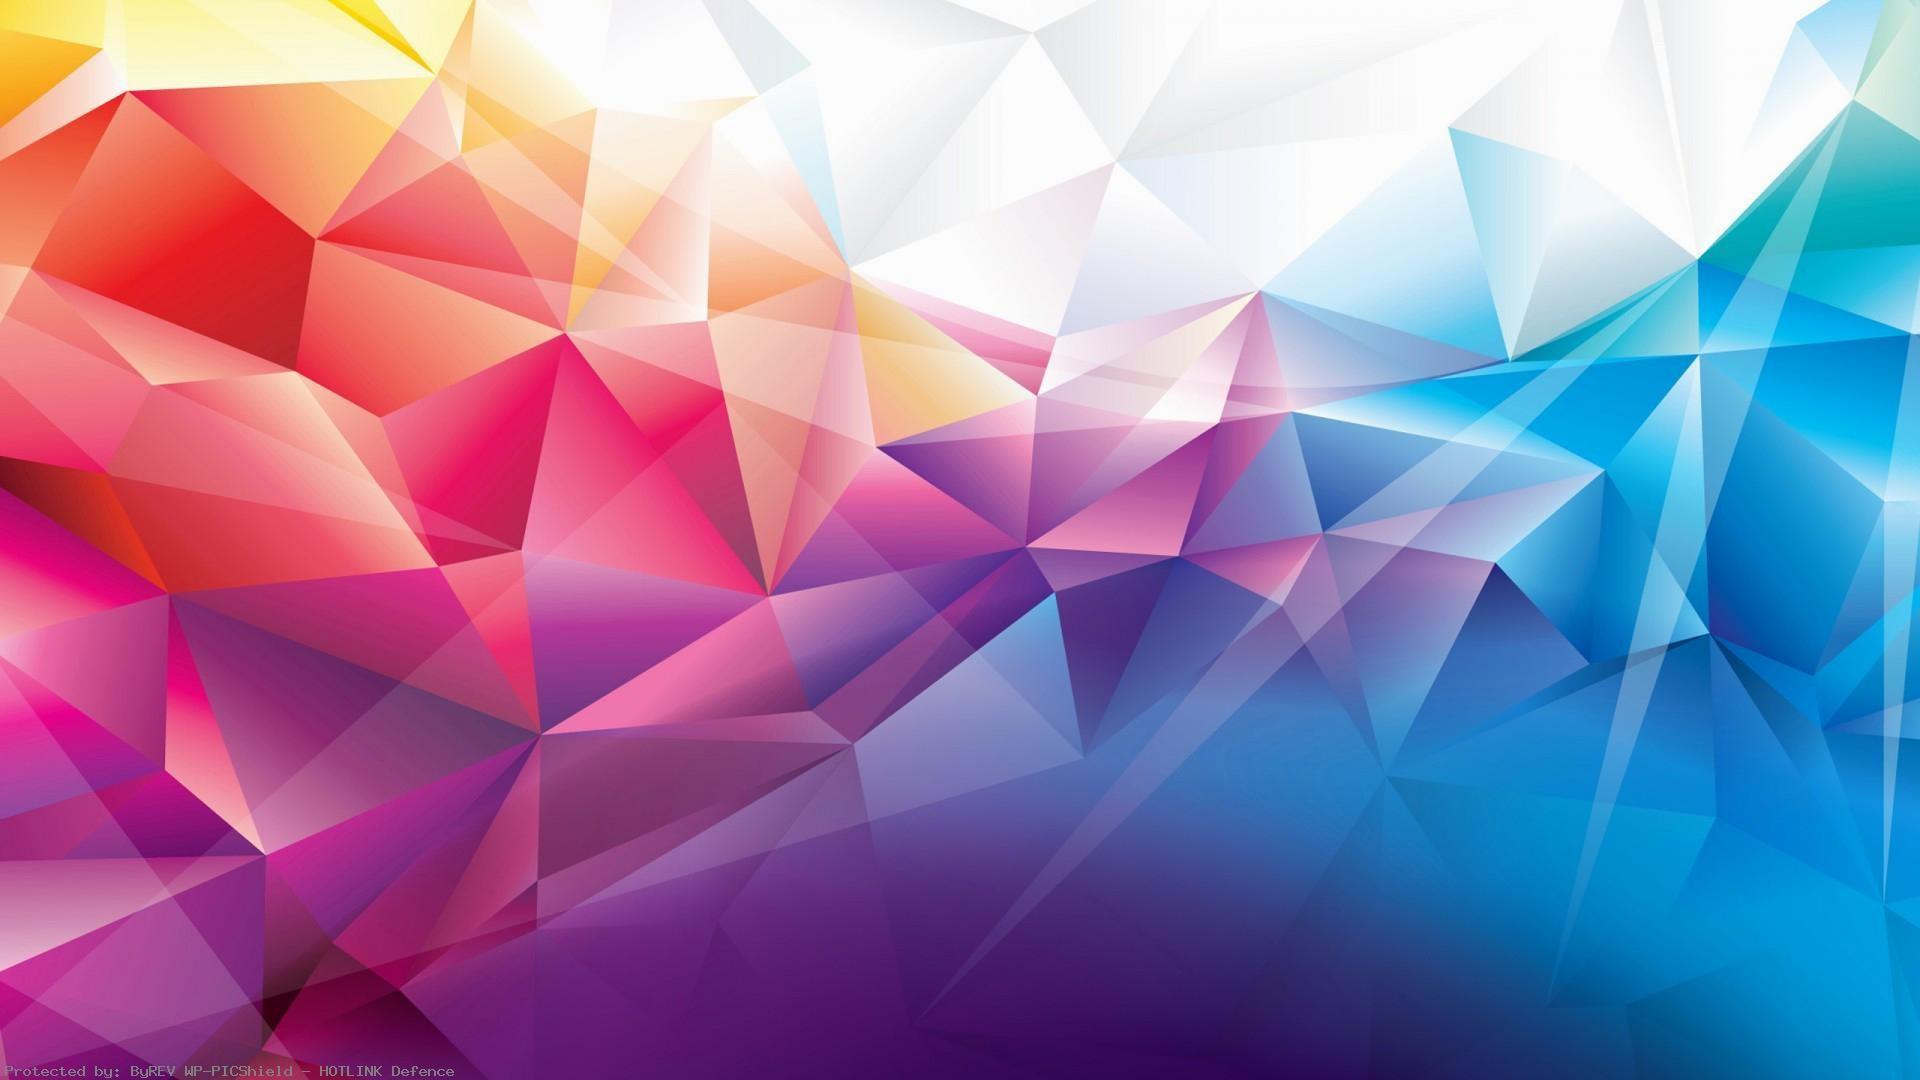 polygon-orange-red-blue-background-pattern-wallpaper-wp60011075